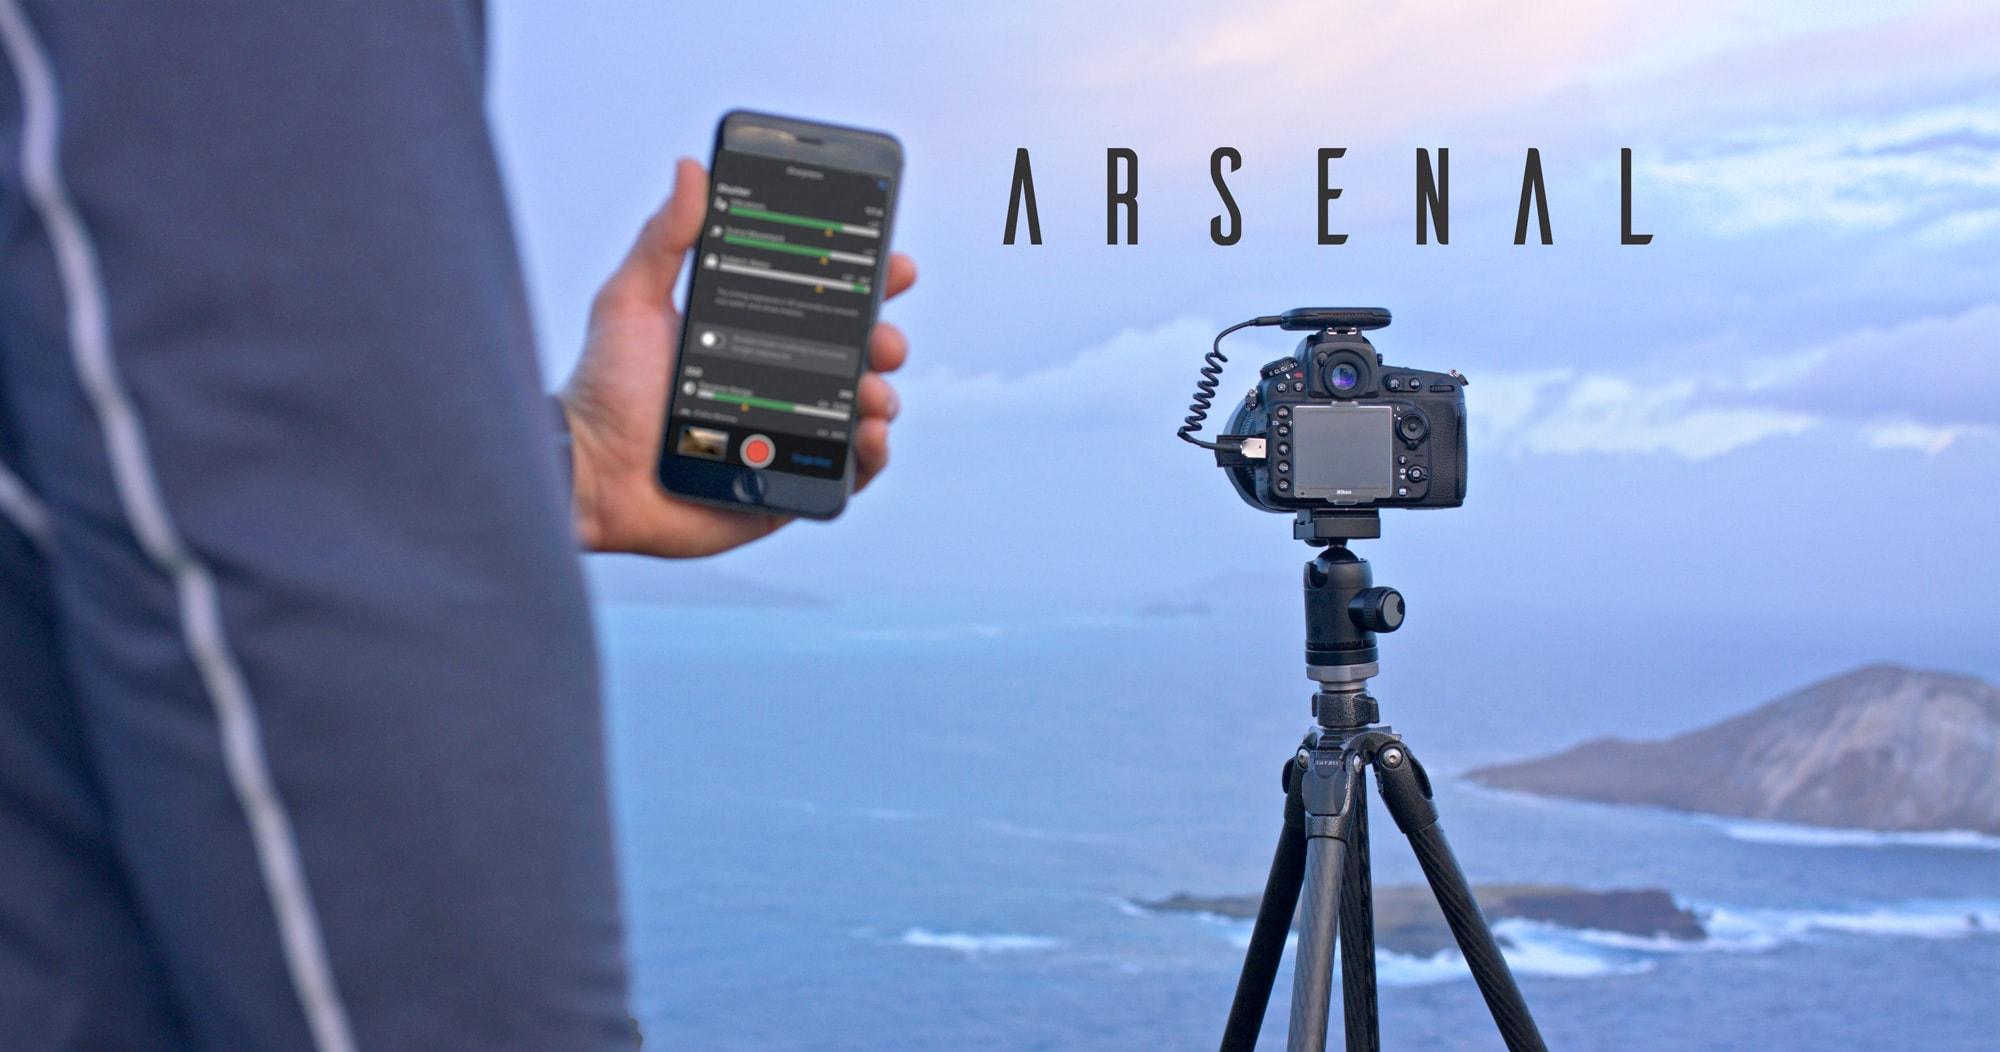 arsenal1 text min image